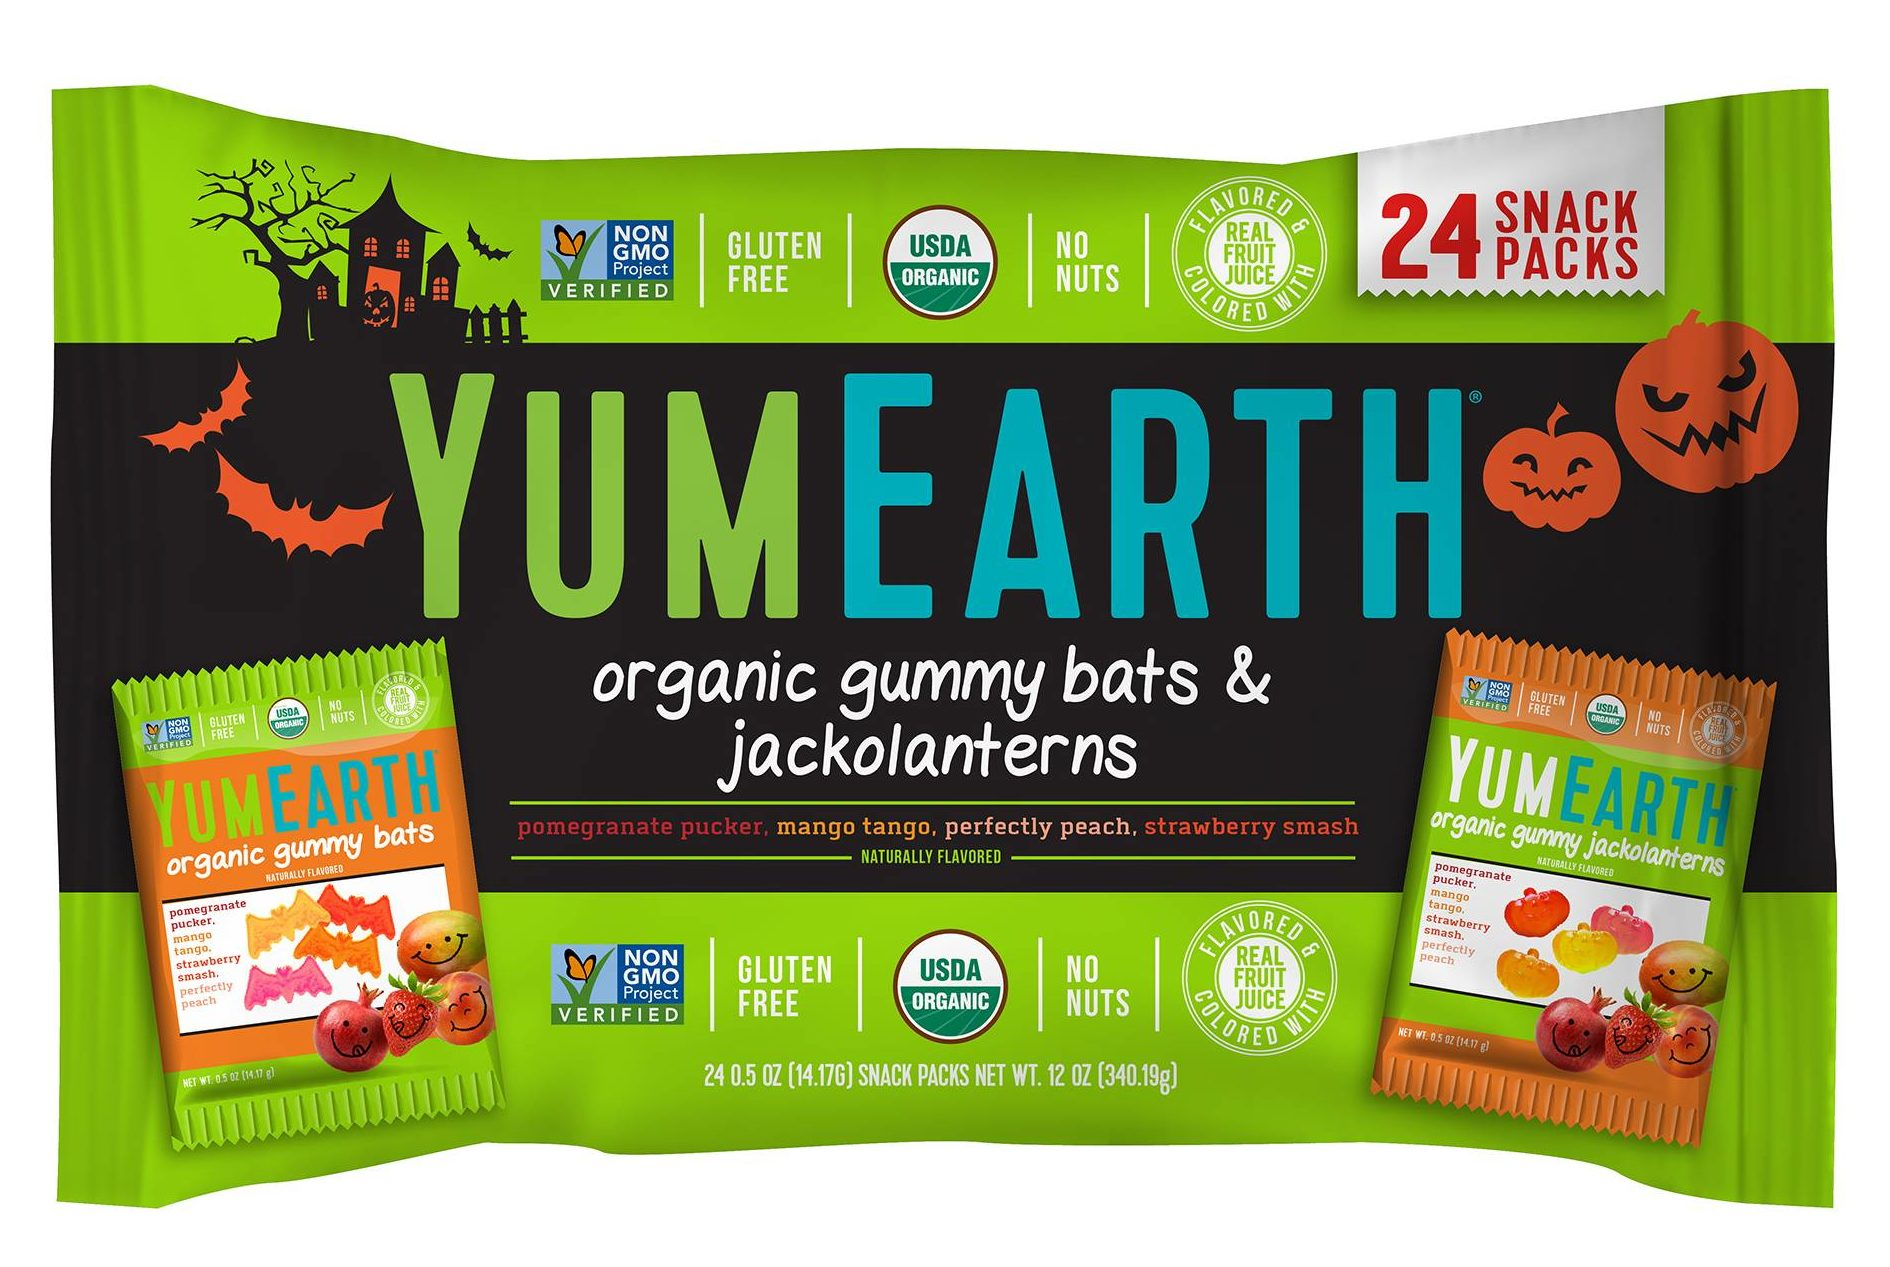 YumEarth Organic Gummies | smelltheroses.com